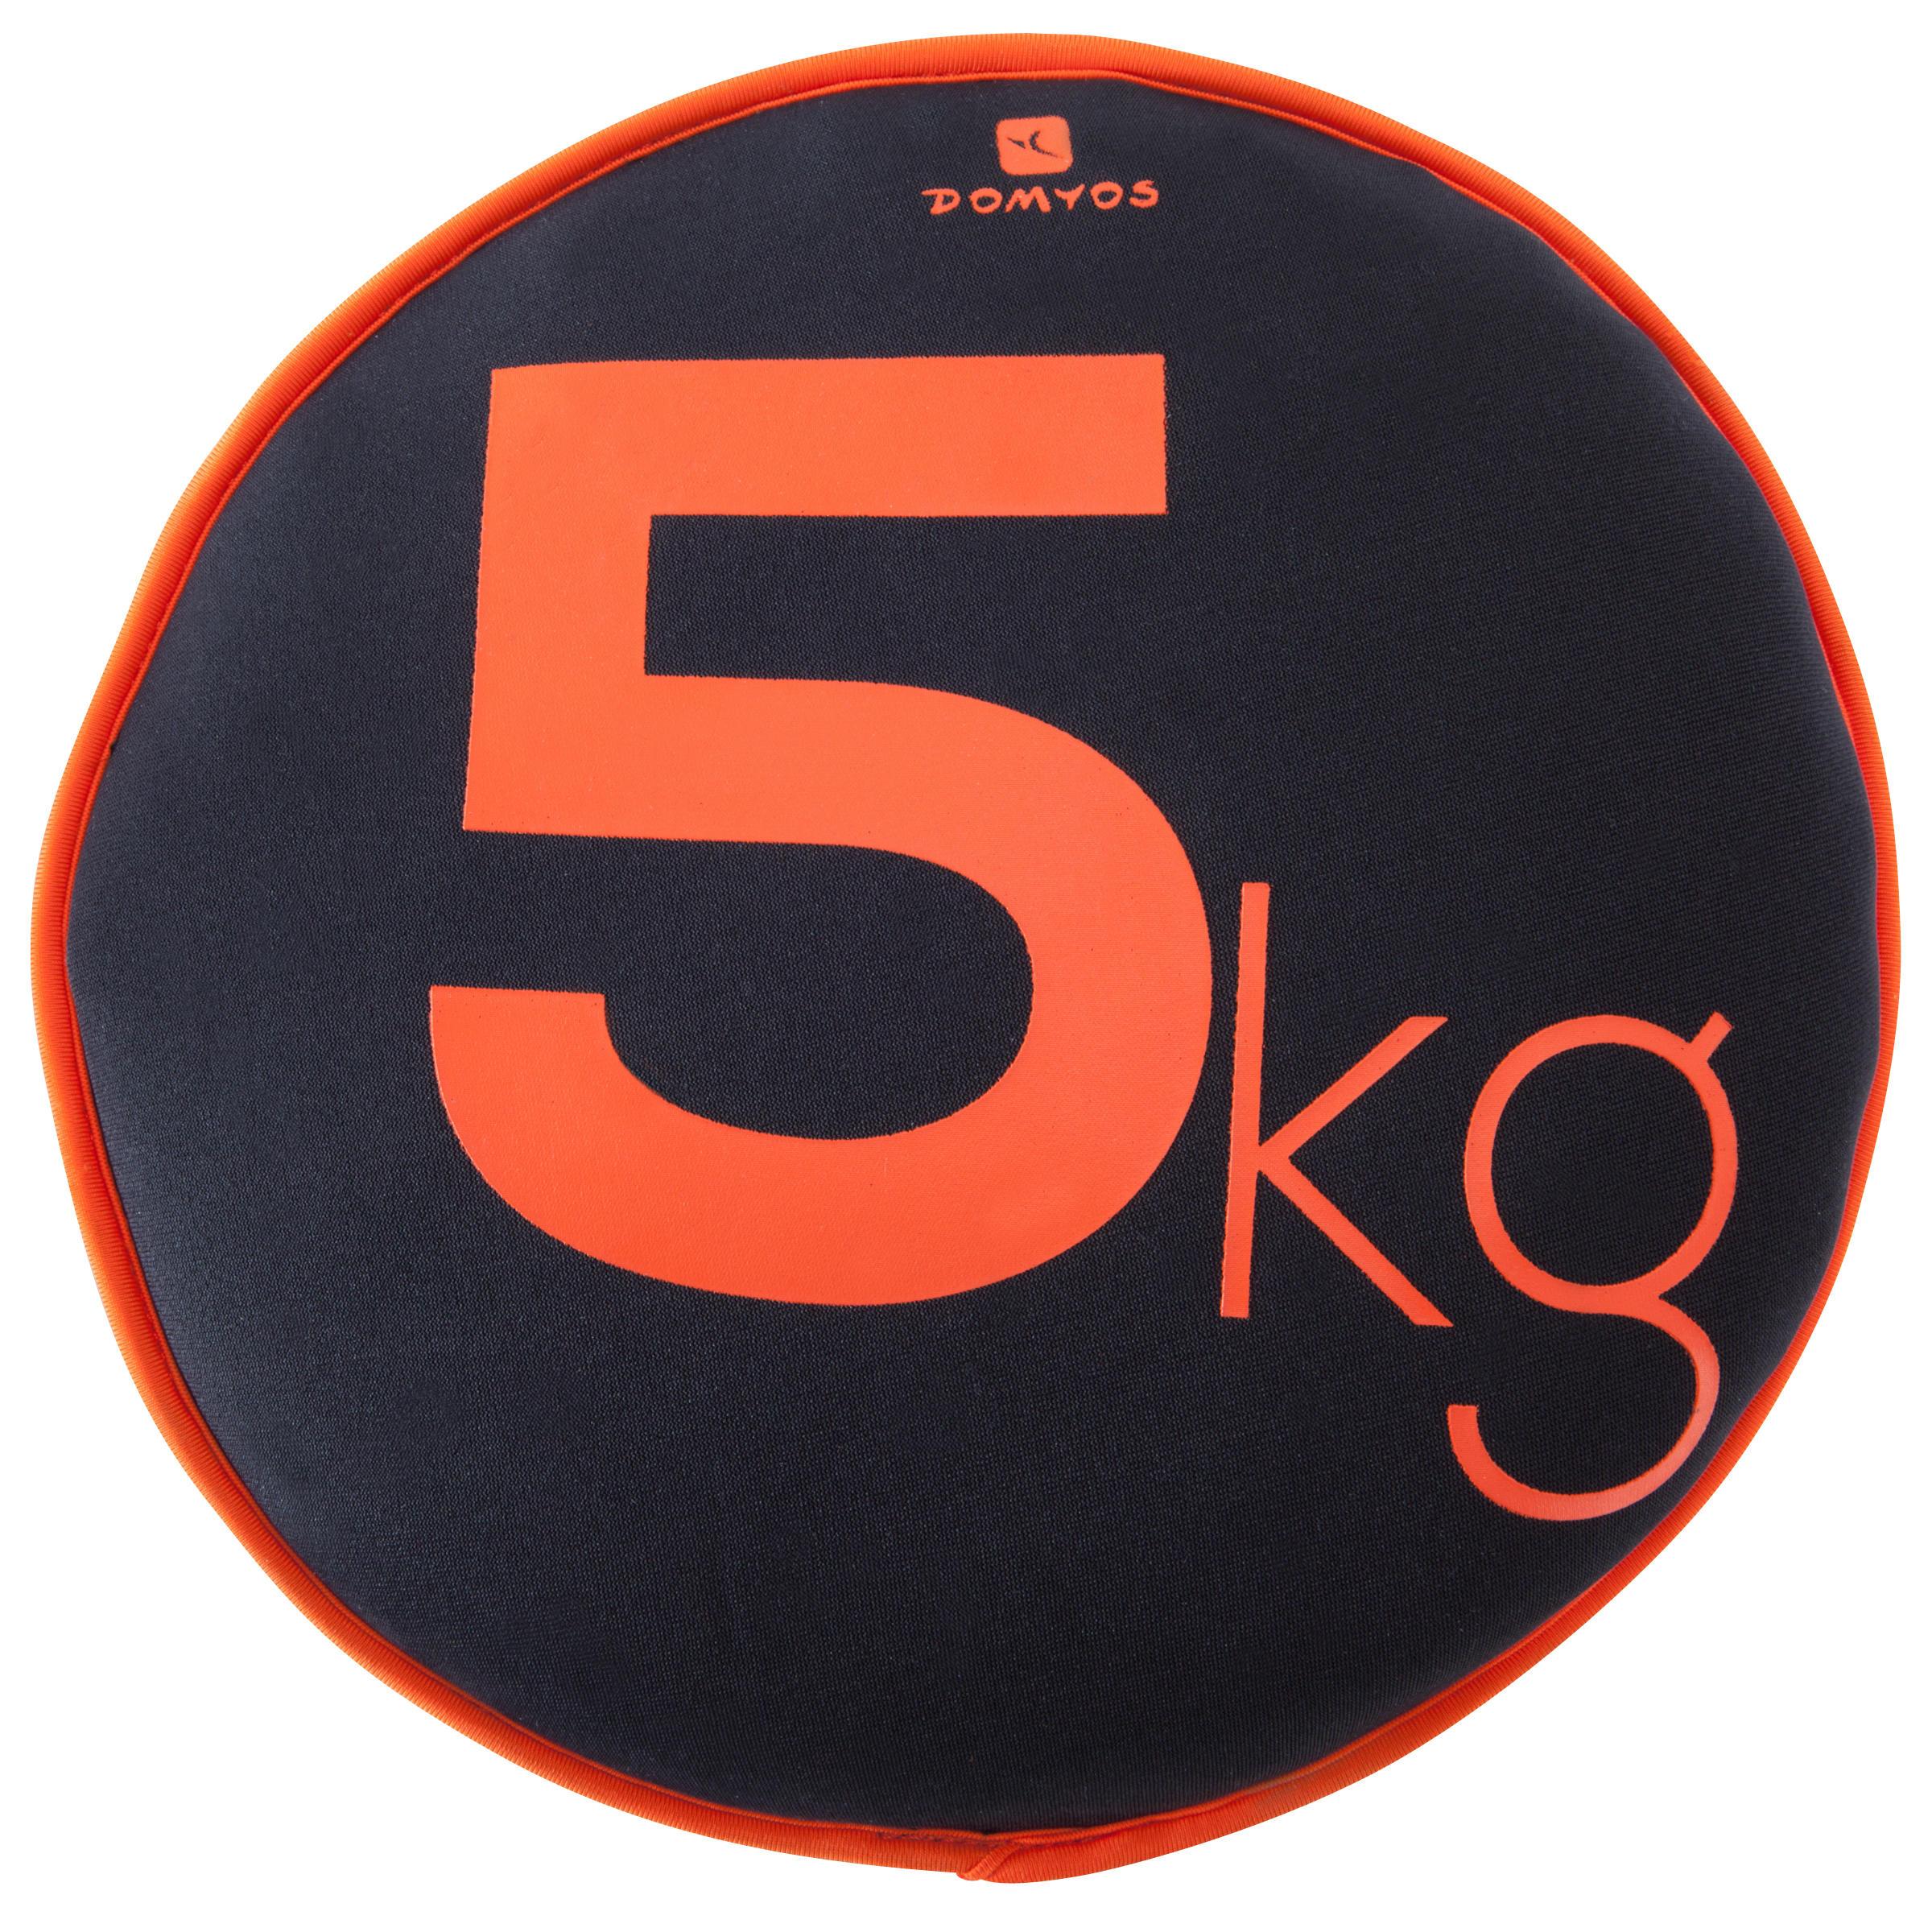 domyos soepele schijf met gewicht gym 5 kg. Black Bedroom Furniture Sets. Home Design Ideas